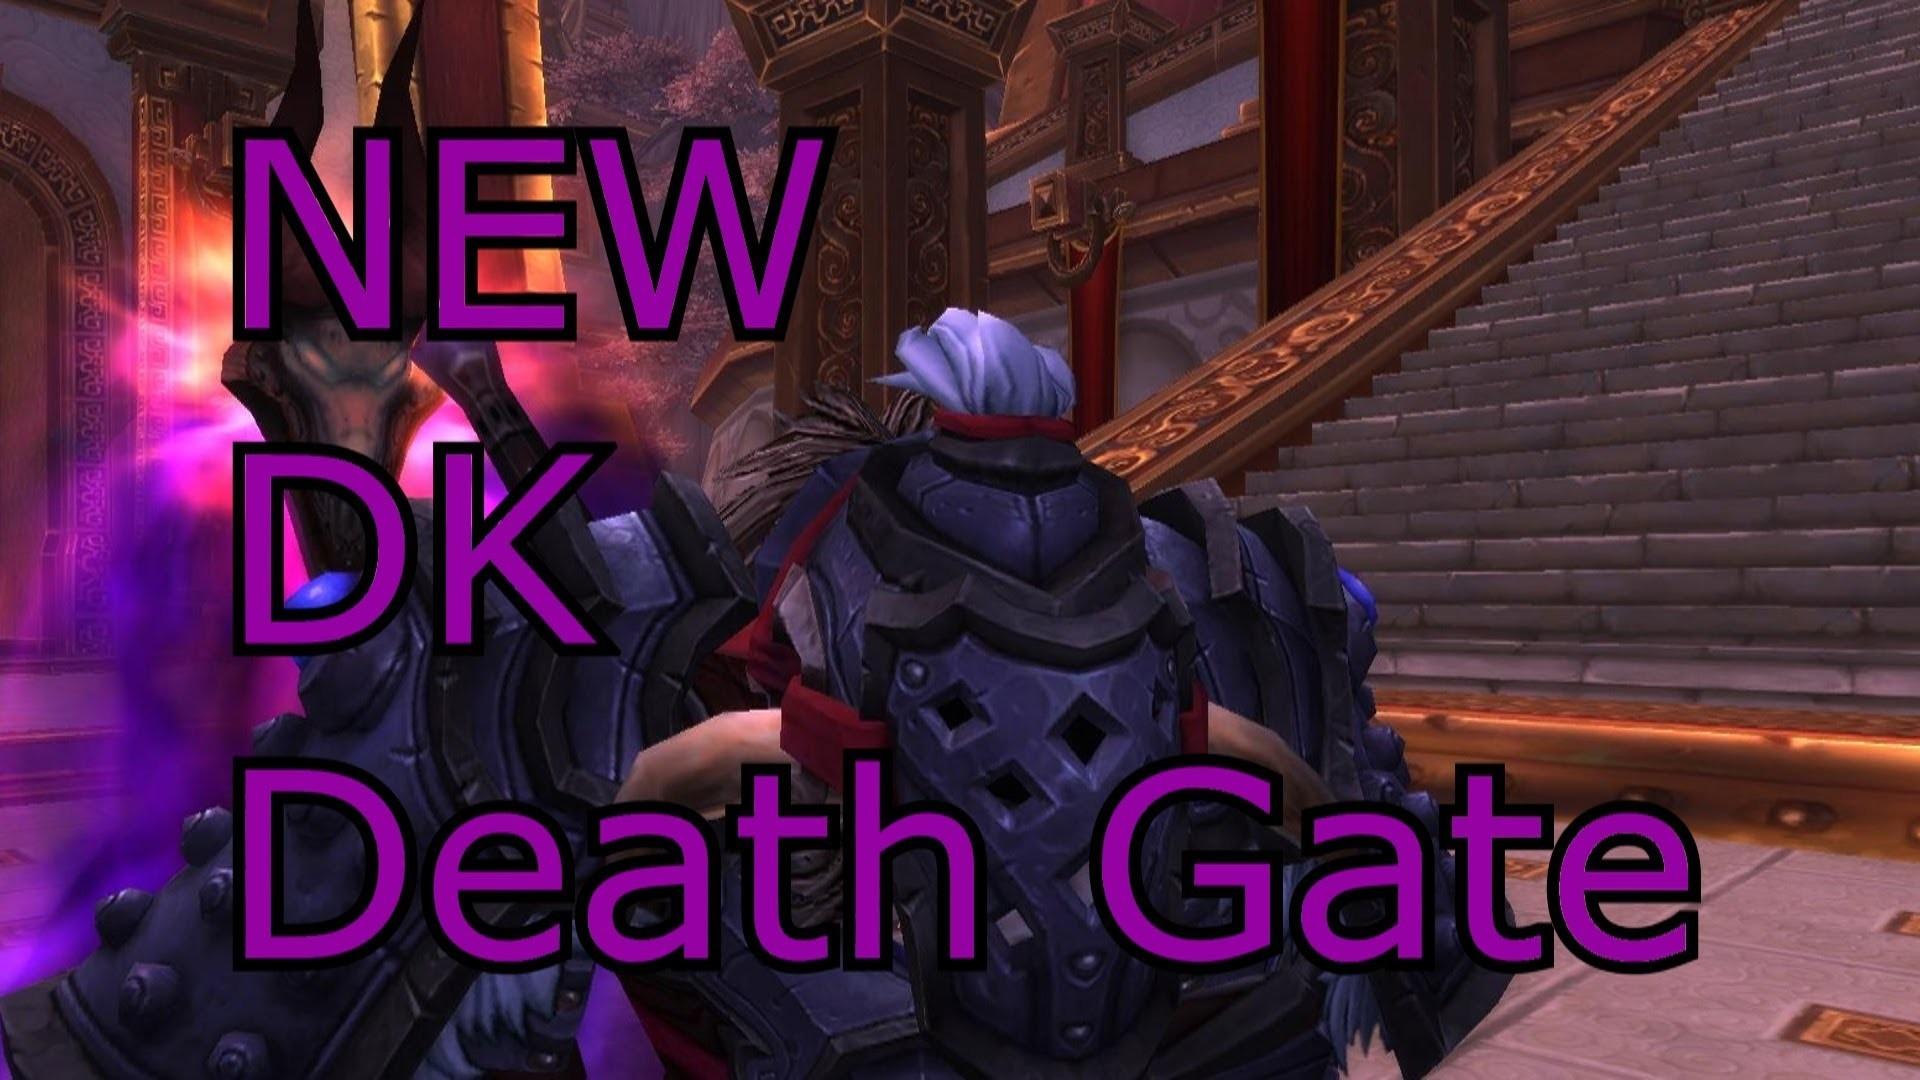 Deathknight Death Gate Changes WoW MoP Patch 5.4